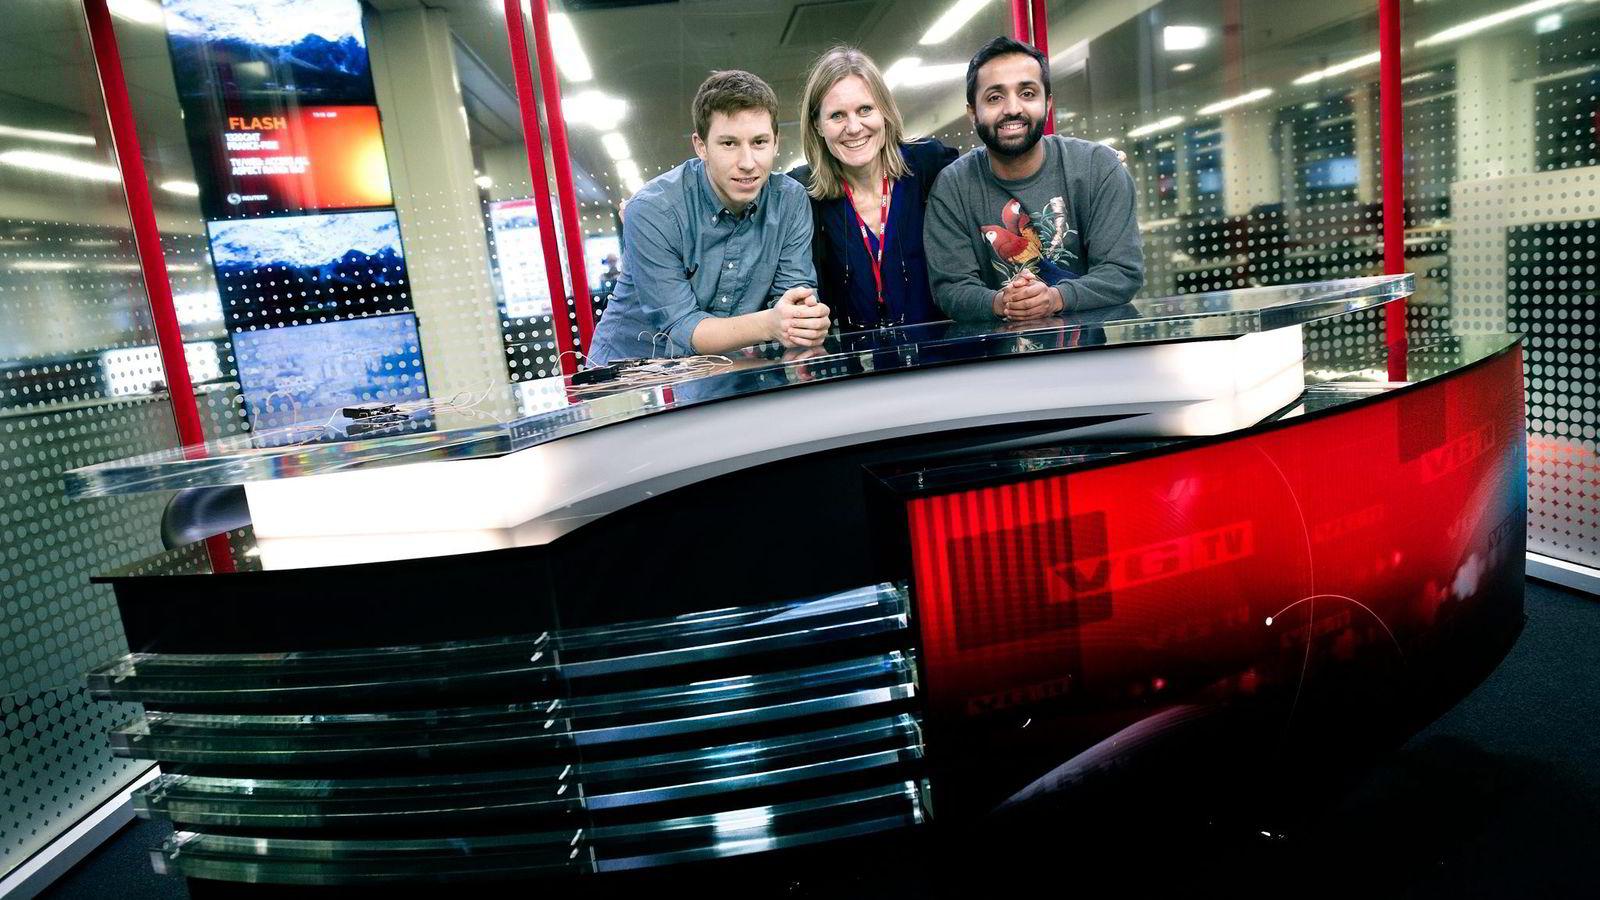 Nikolai Kleivan (fra venstre), Helje Solberg og Fawad Ashraf i VGTV utfordrer TV 2 Nyhetskanalen med egen nyhetskanal på Canal Digital.